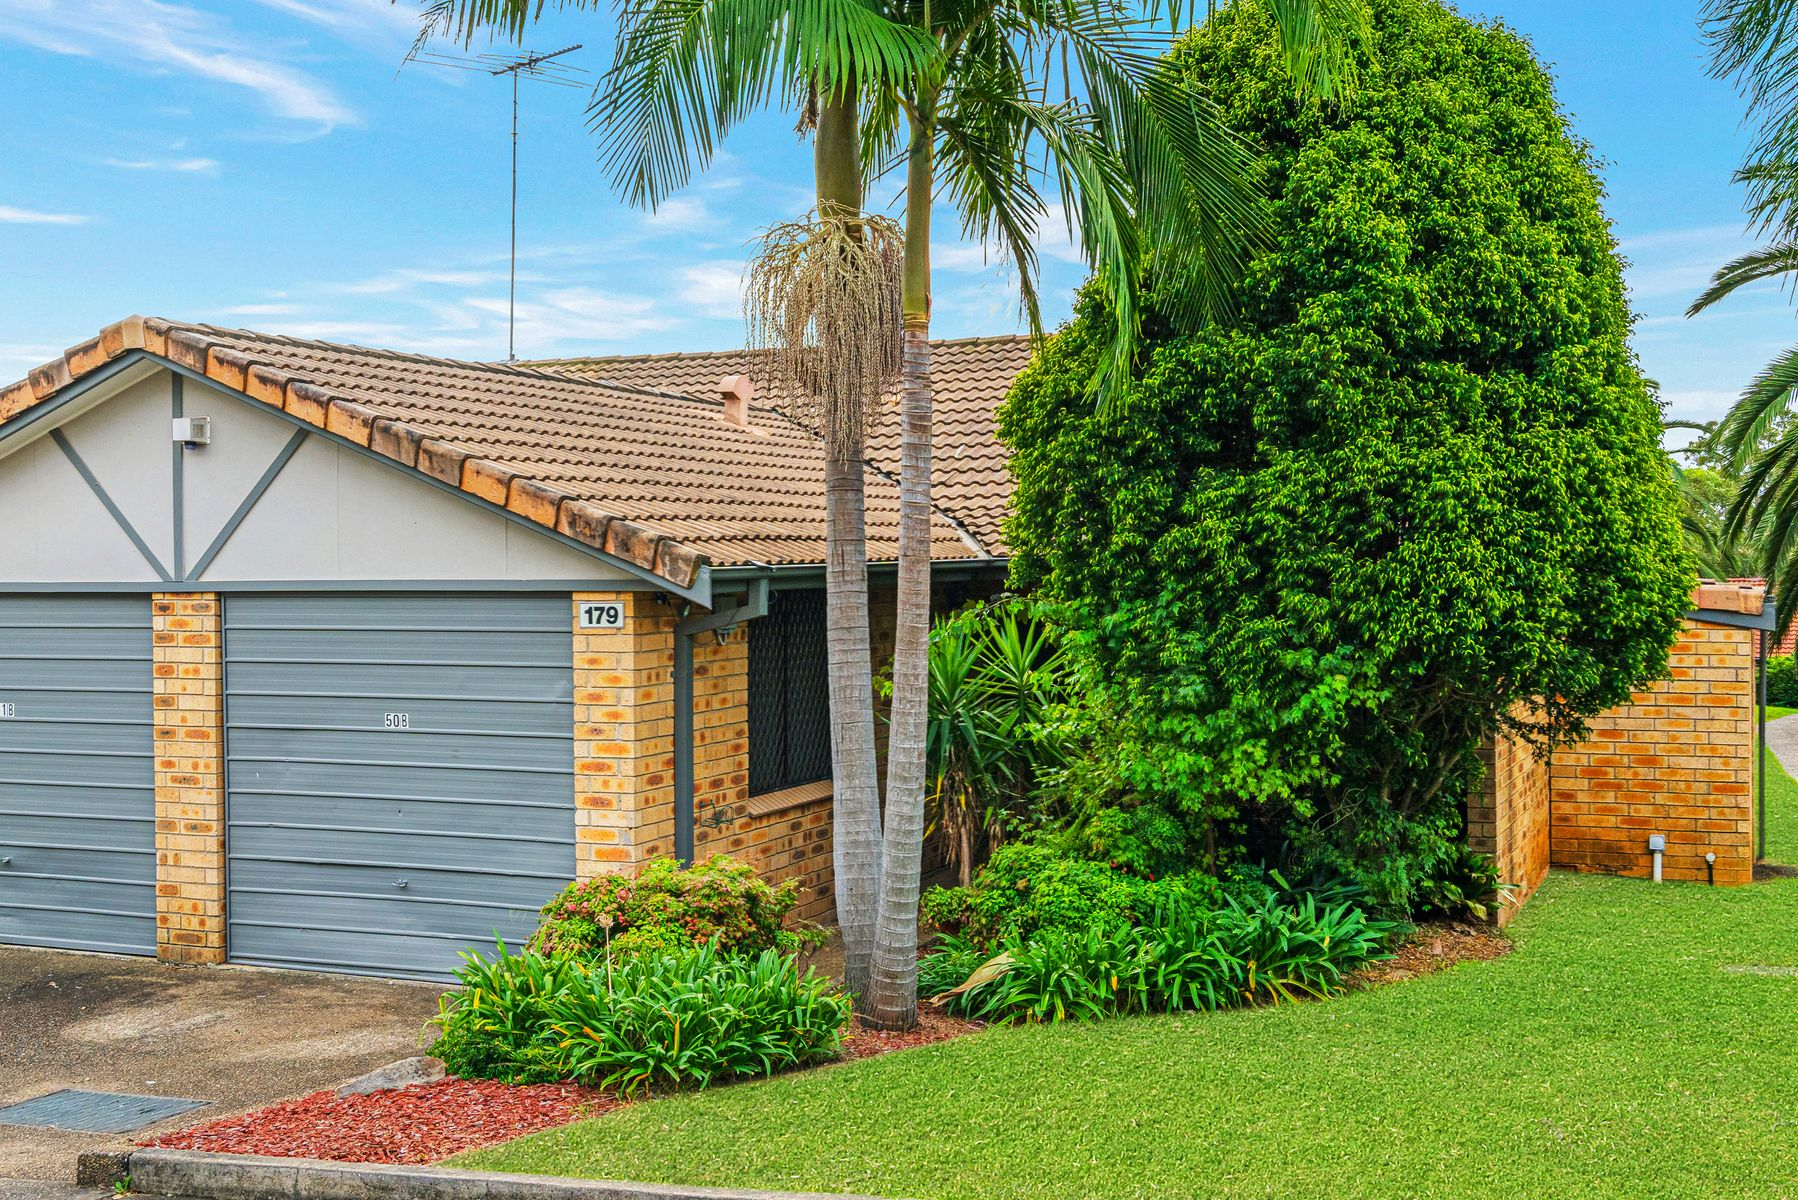 50B/179 Reservoir Road, Blacktown, NSW 2148